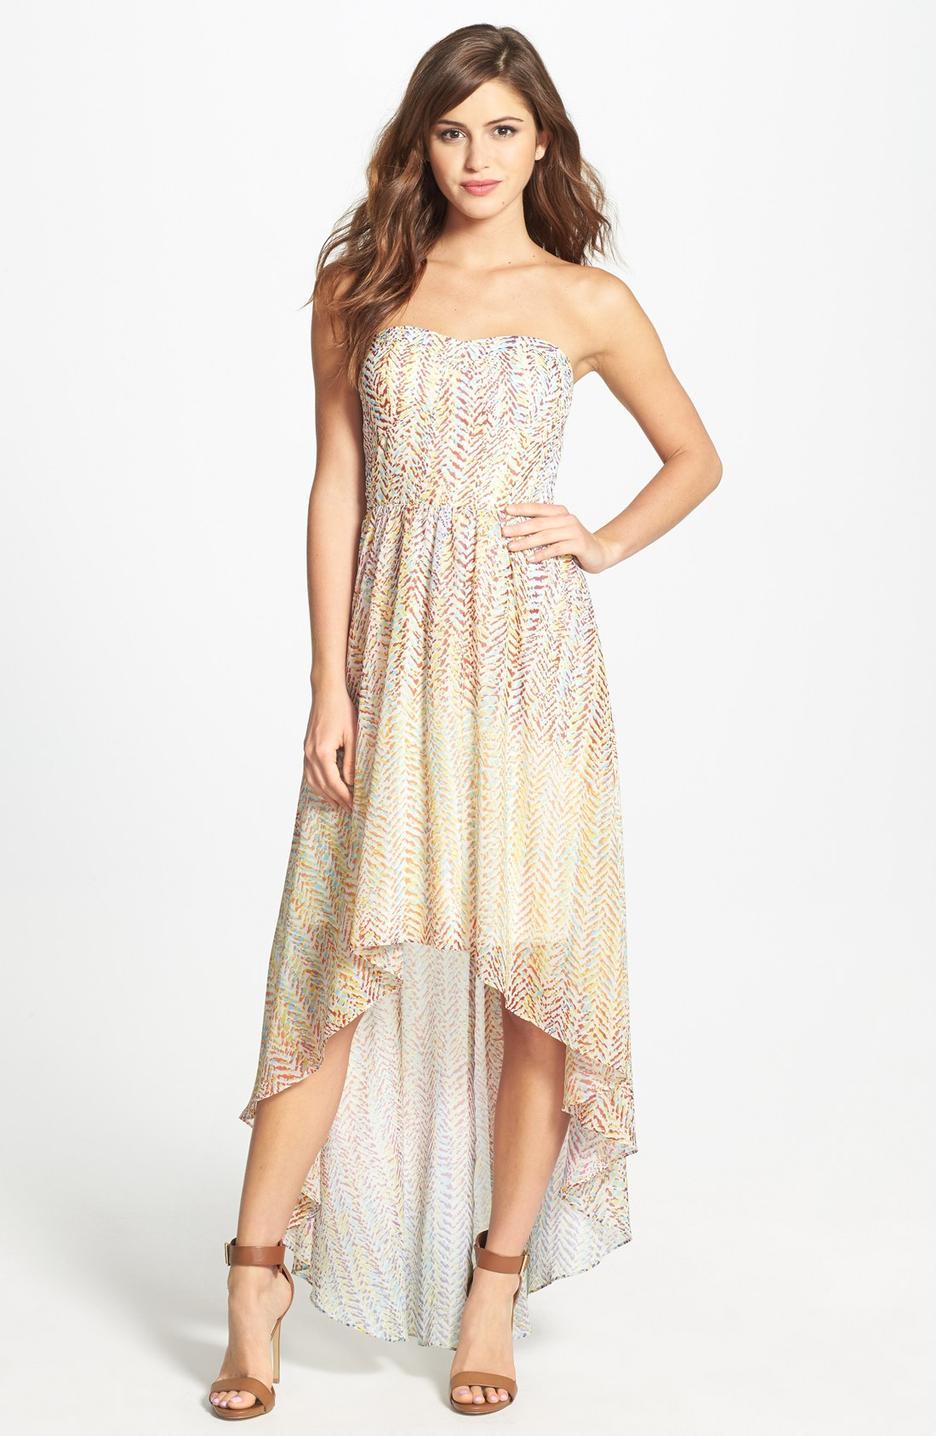 High Low Chiffon Dress Dressedupgirl Com